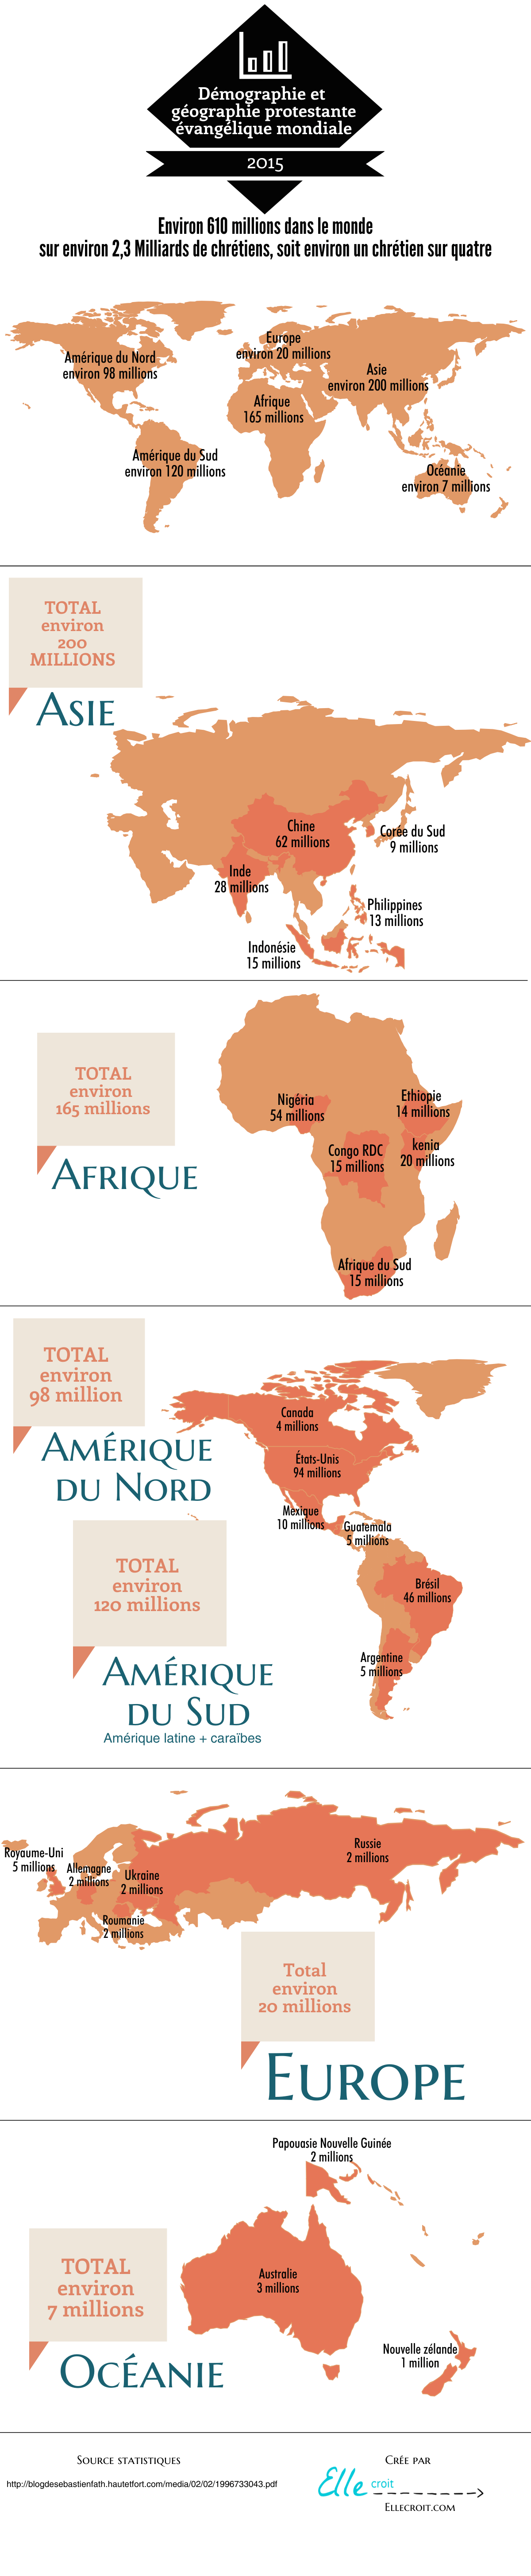 Statistiques évangéliques 2015 ellecroit.com